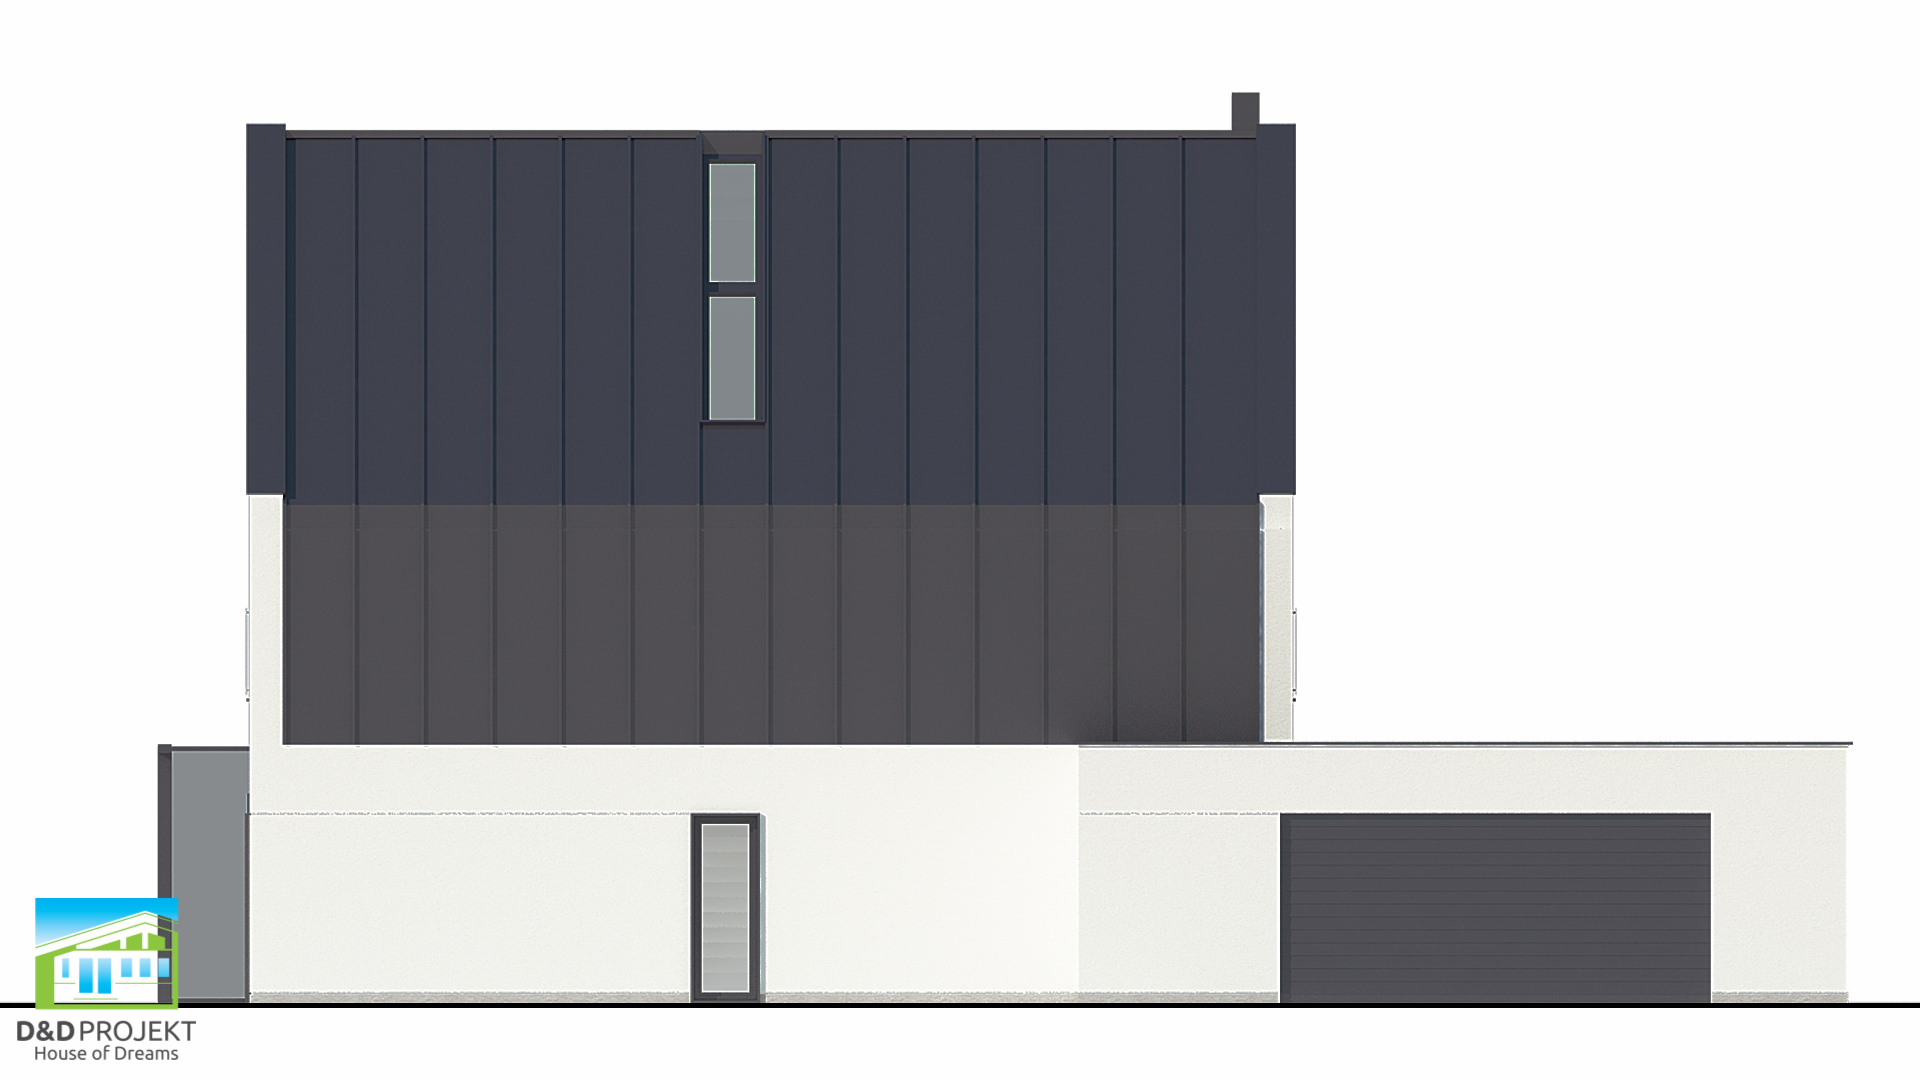 https://ddprojekt.pl/wp-content/uploads/2020/03/elewacja3-7.jpg